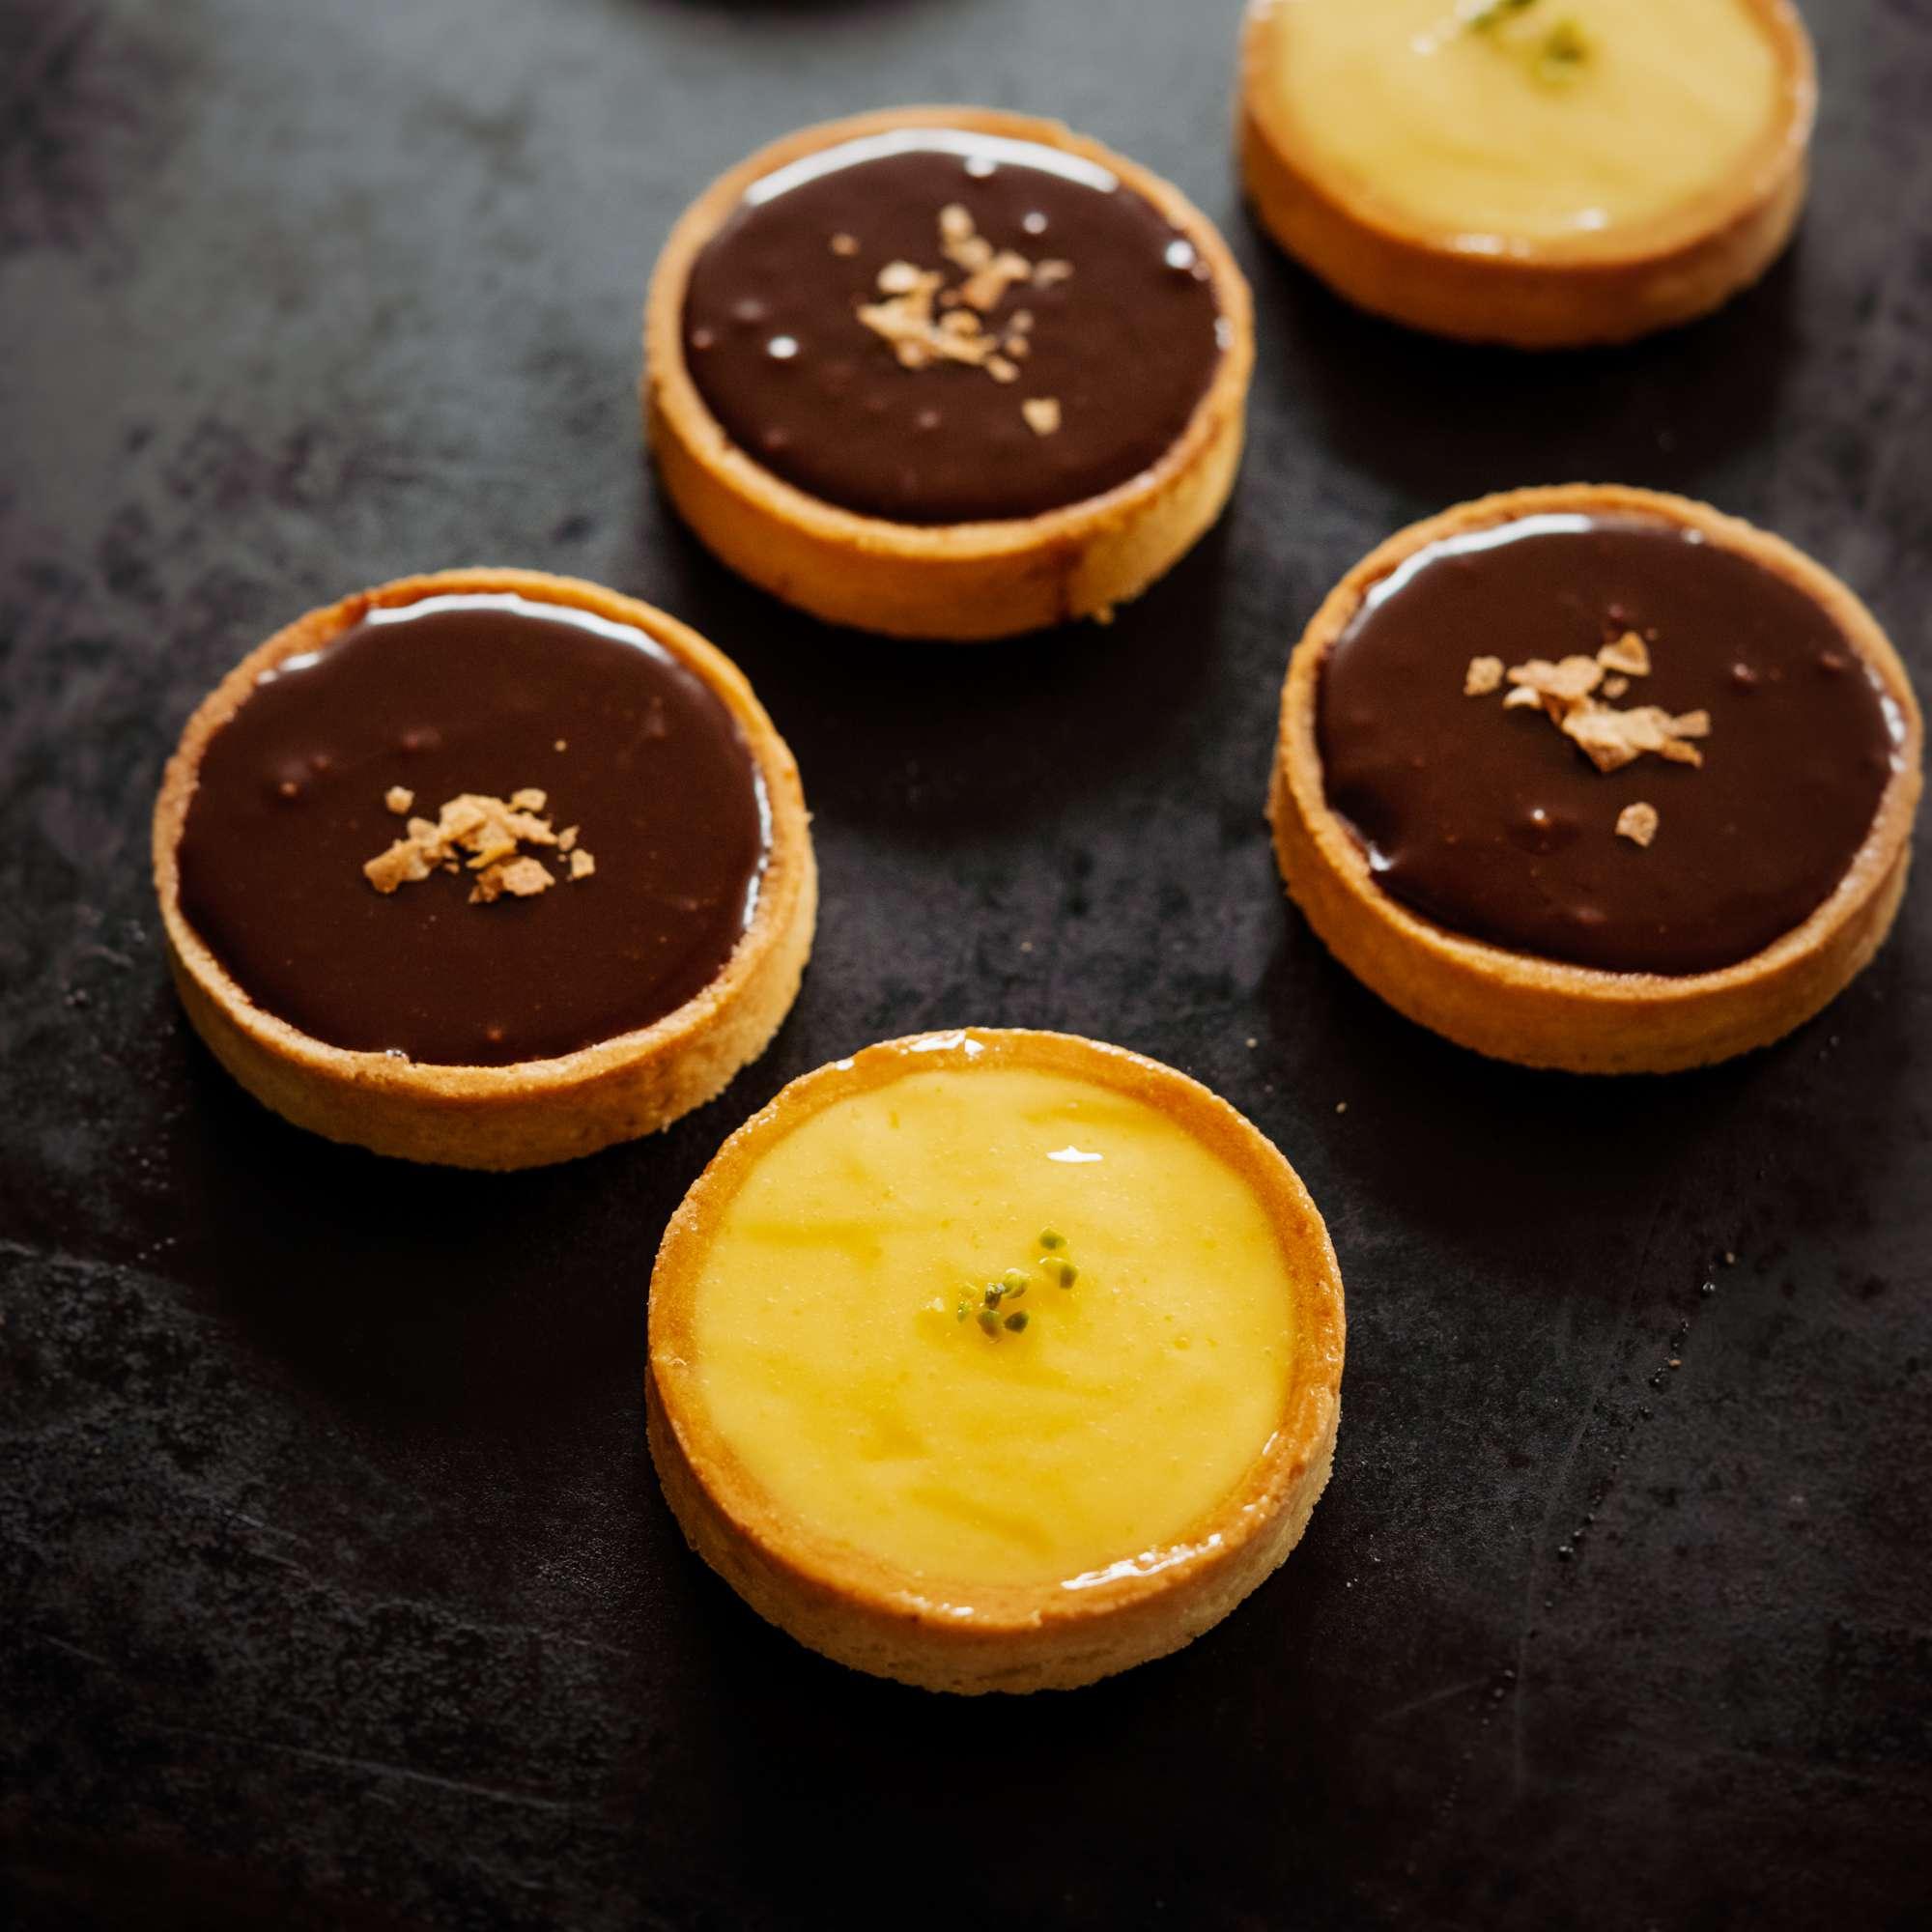 Tarte au Chocolat, Tarte au Citron, Tarte au Ganache Caramel